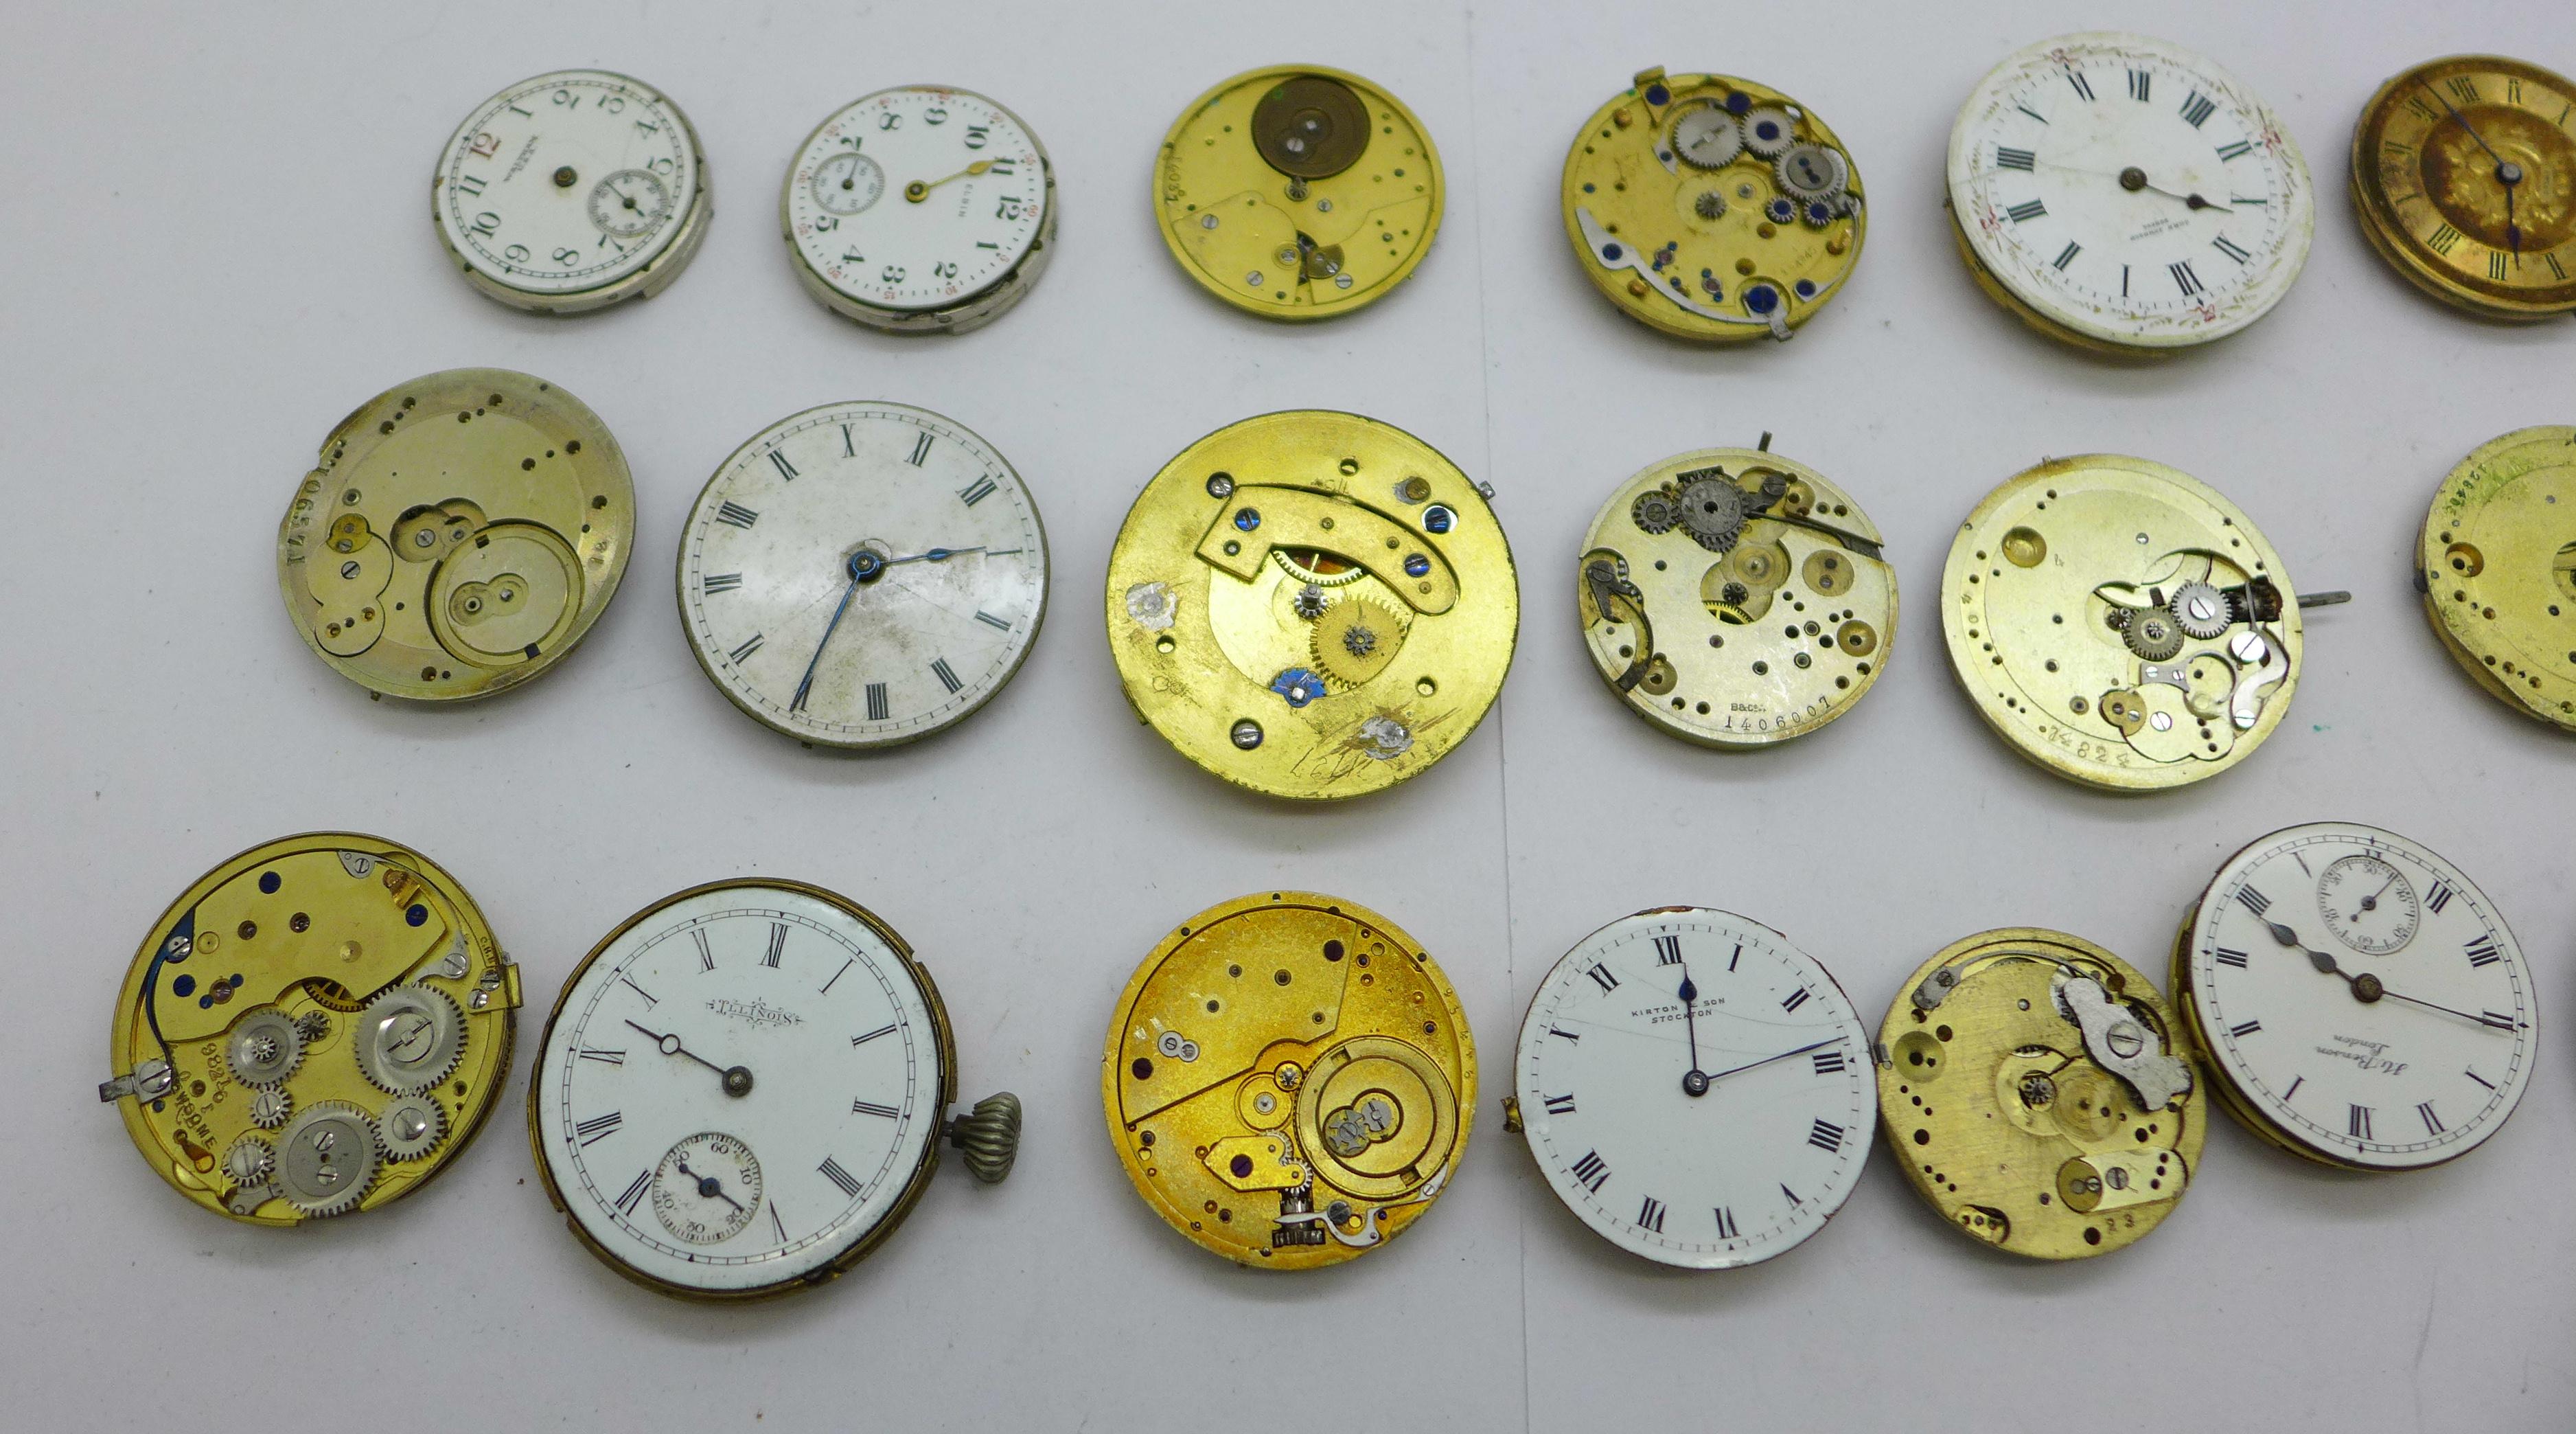 Twenty-five wristwatch, fob and pocket watch movements, Elgin, JW Benson, Waltham, etc. - Image 2 of 4